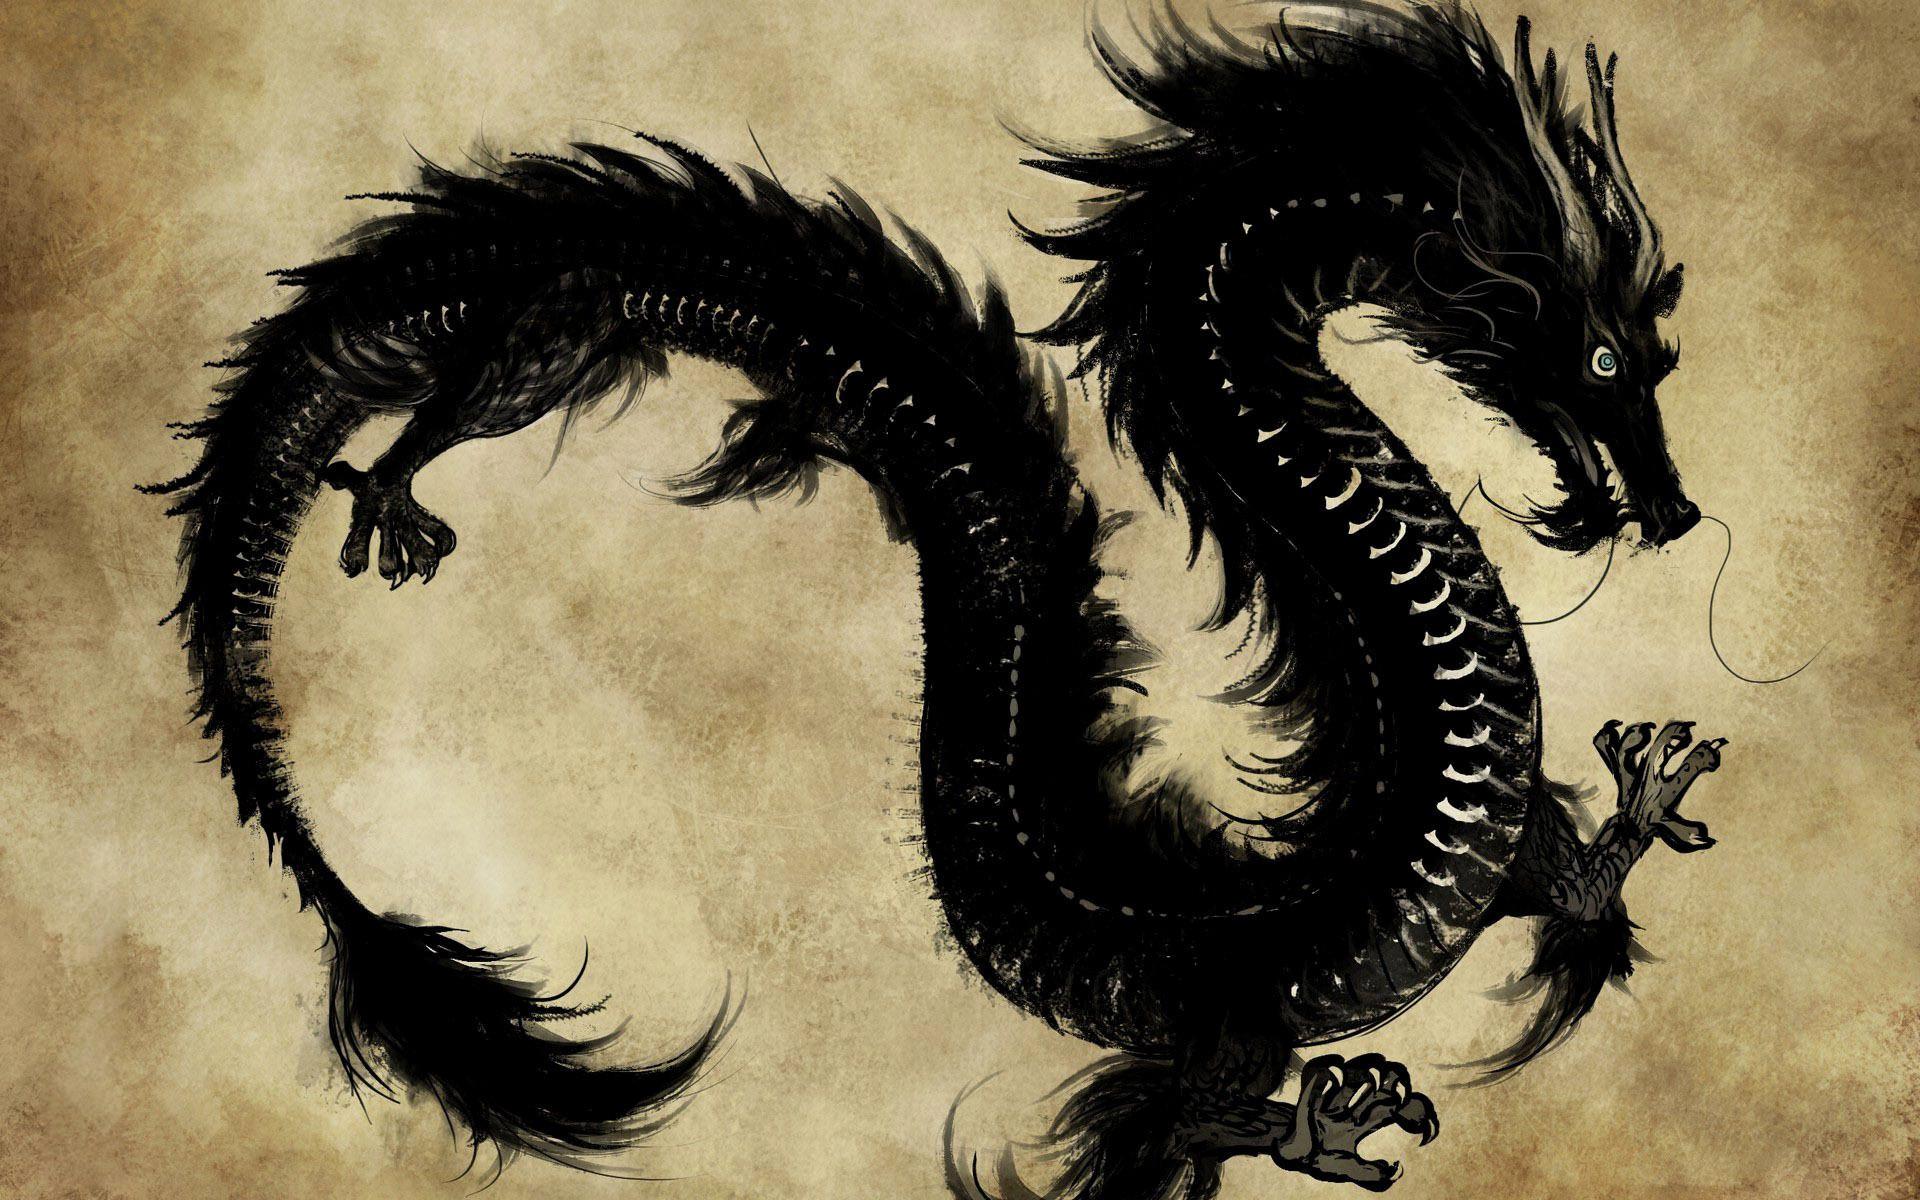 Res: 1920x1200, Dragon Wallpapers New oriental Dragon Wallpaper Chinese Dragon Hd Wallpapers